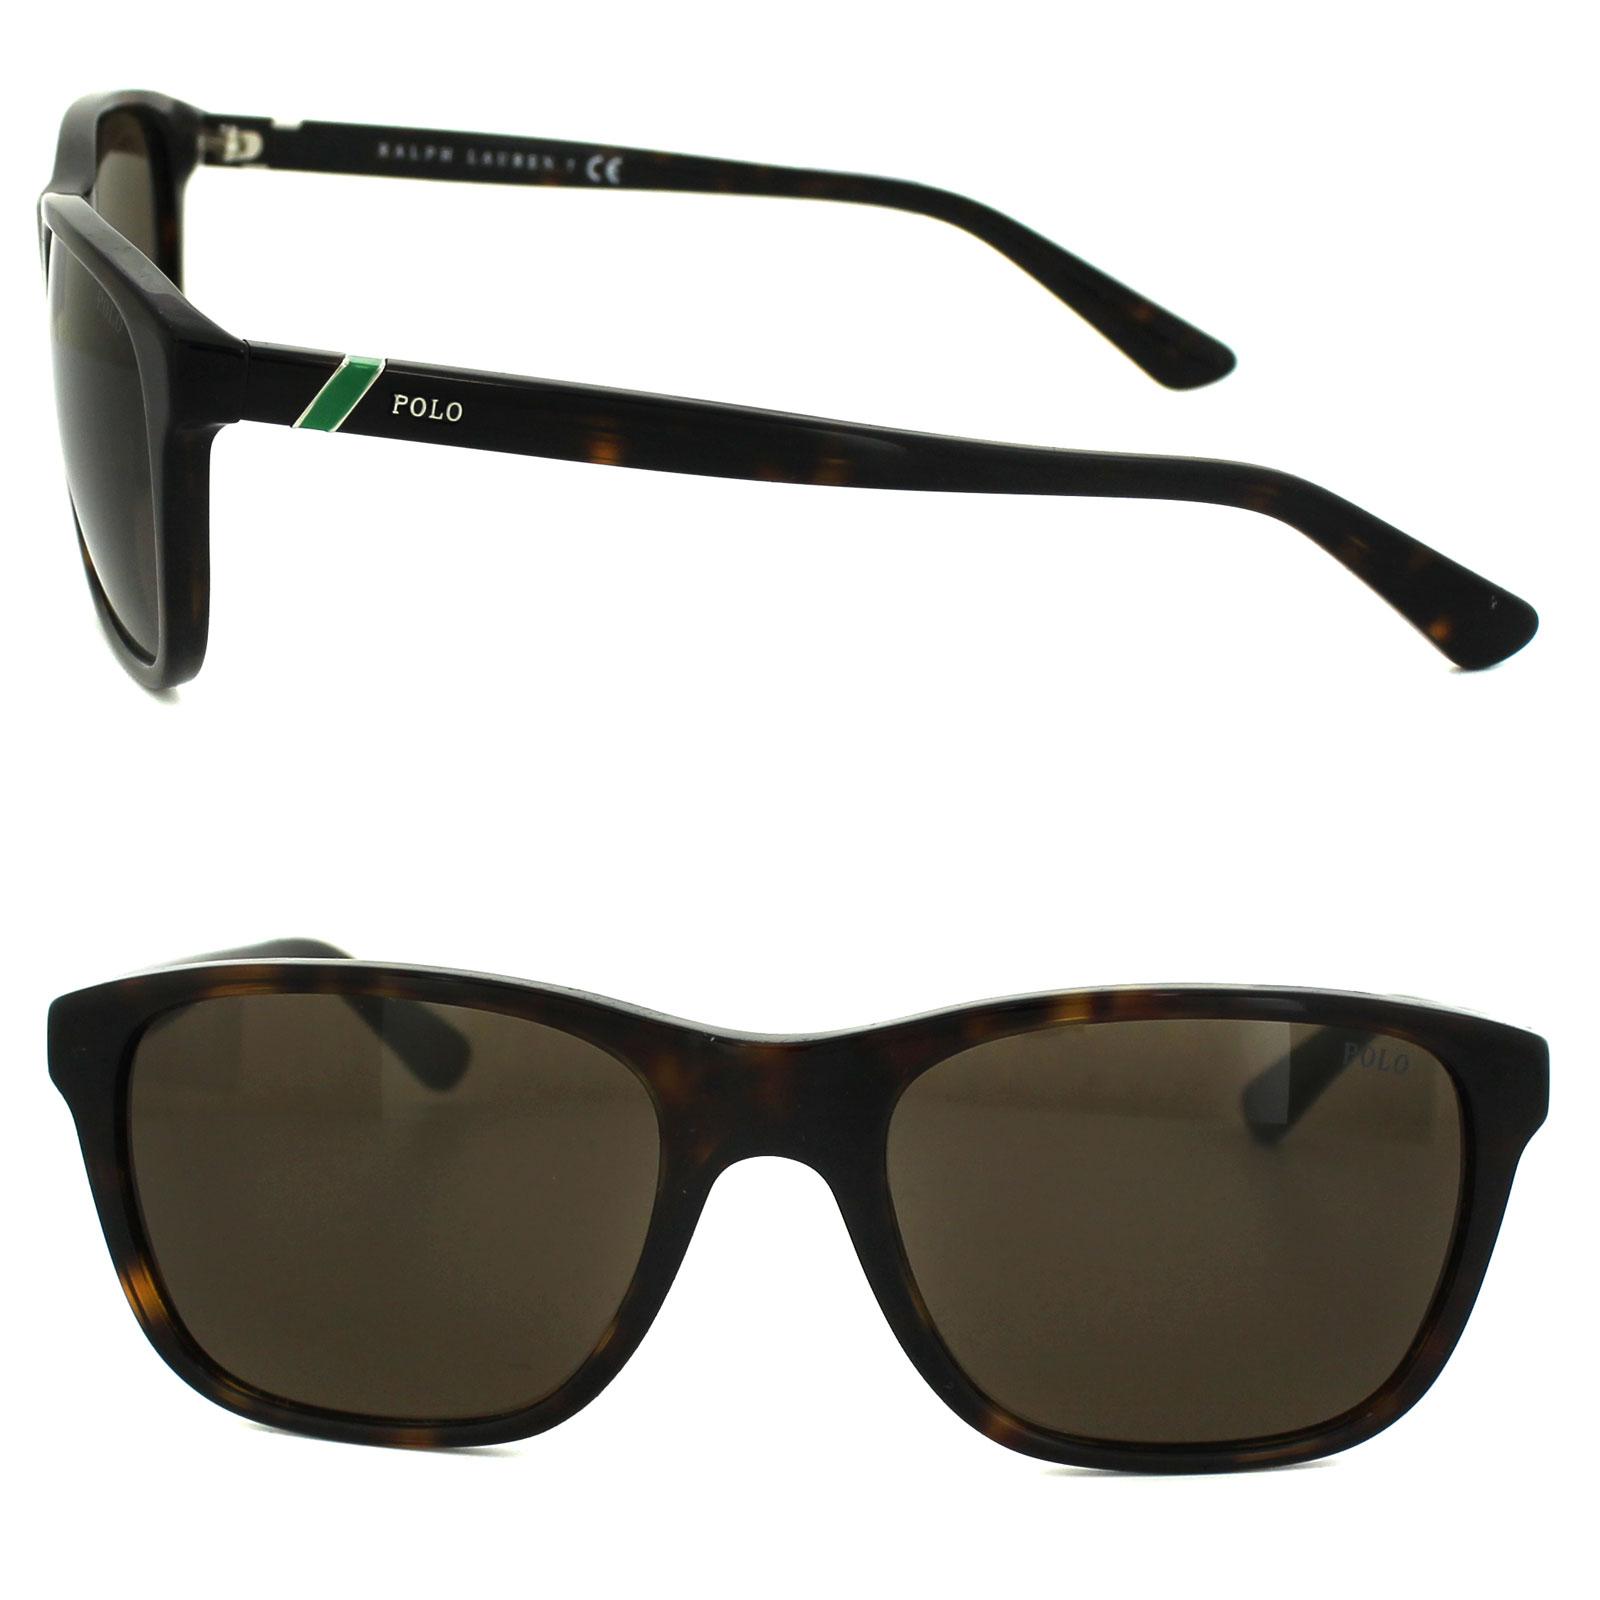 c19169b43 Cheap Polo Ralph Lauren 4085 Sunglasses - Discounted Sunglasses